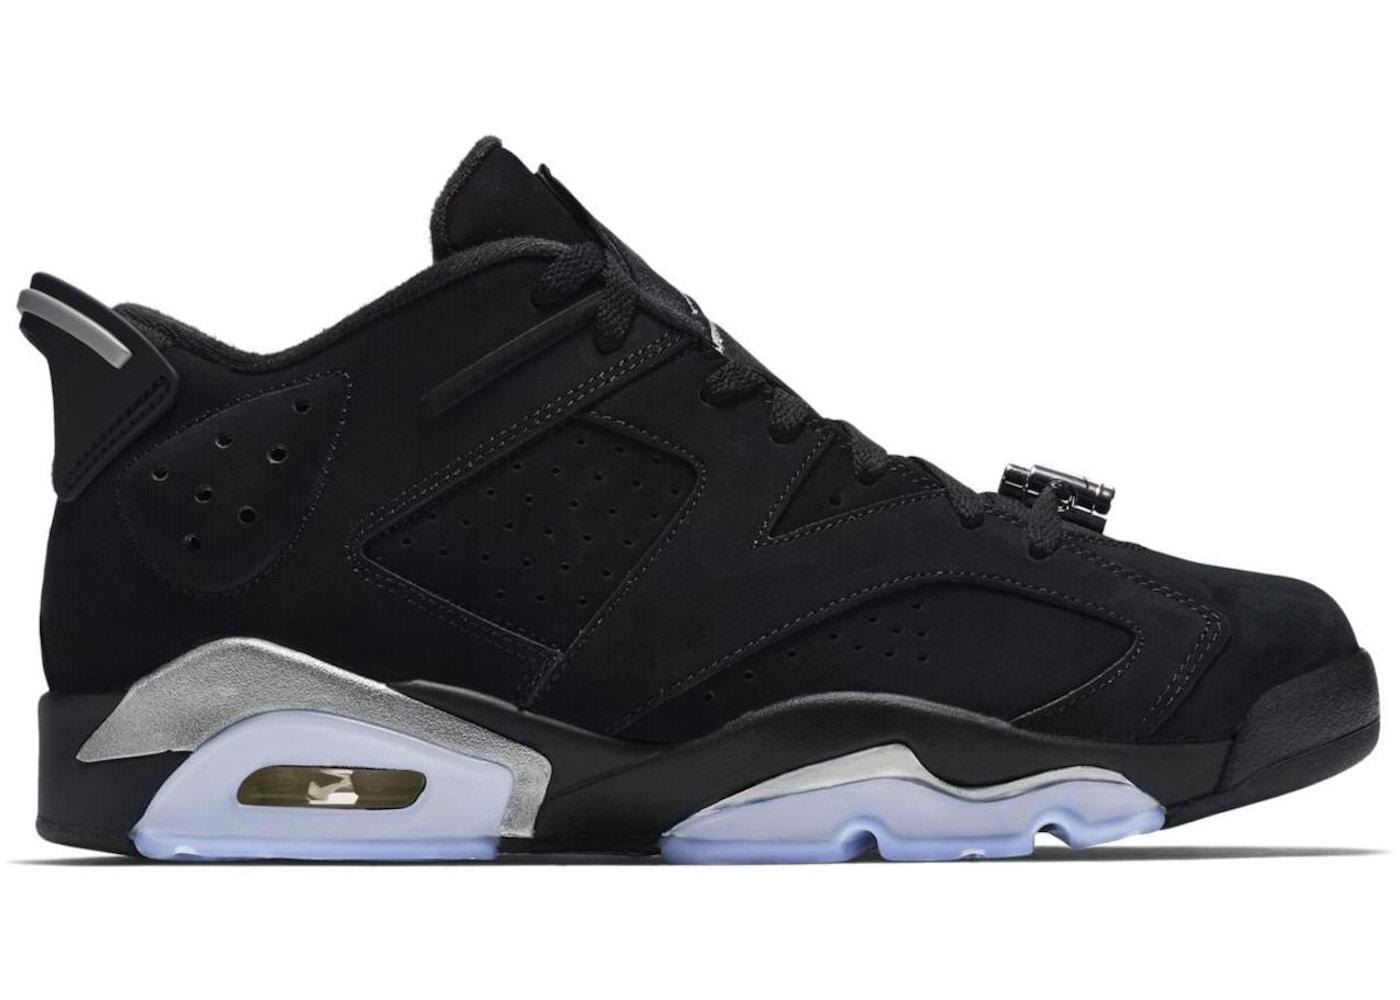 purchase cheap 92c22 5729c Air Jordan 6 Size 17 Shoes - Release Date